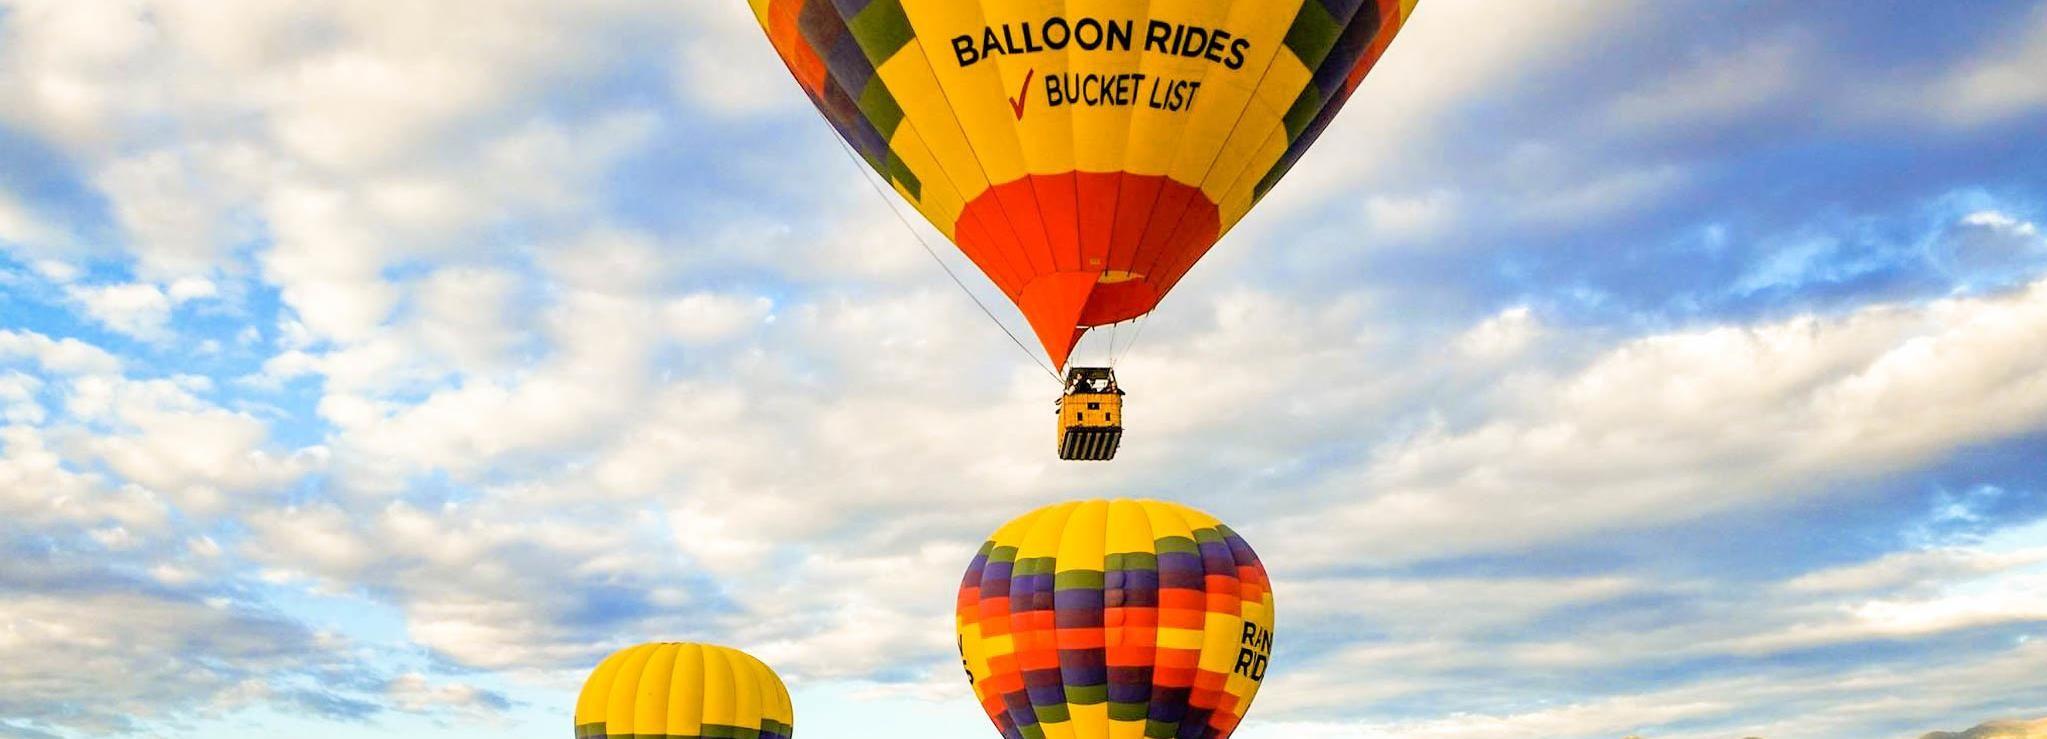 Colorado Springs: Heißluftballonflug bei Sonnenaufgang